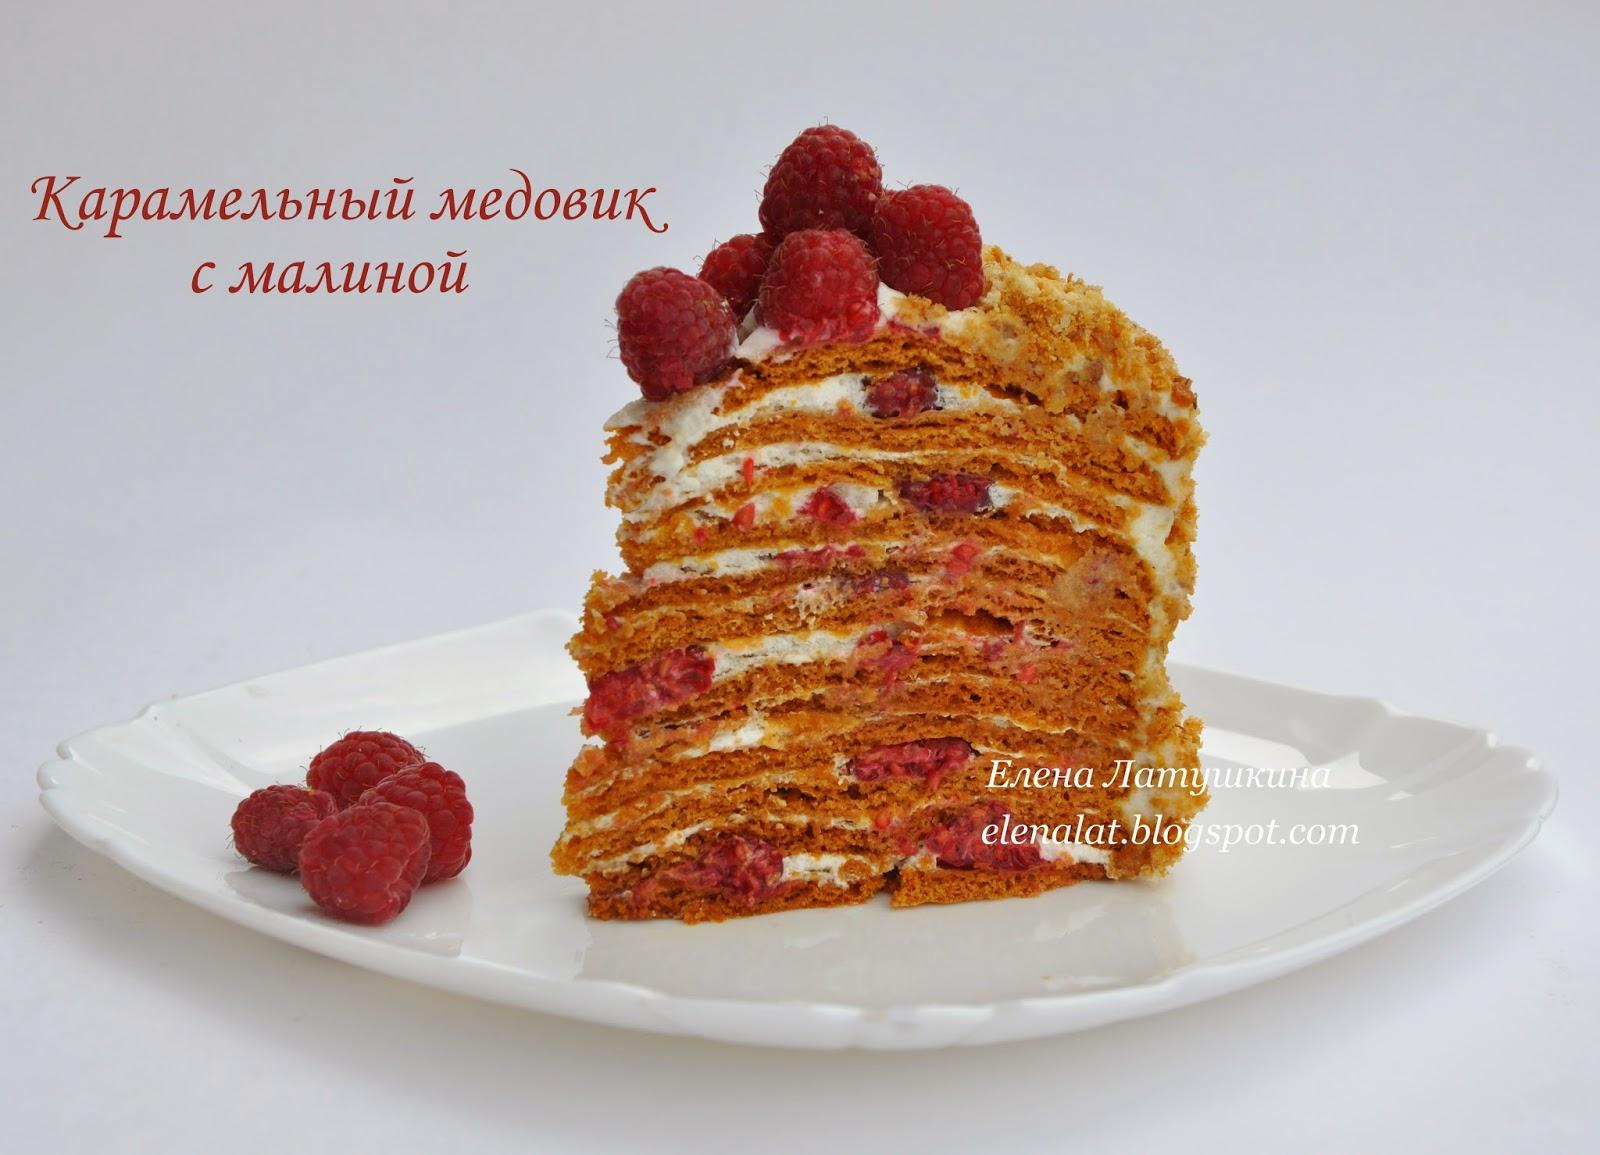 рецепт карамельного медовика с фото